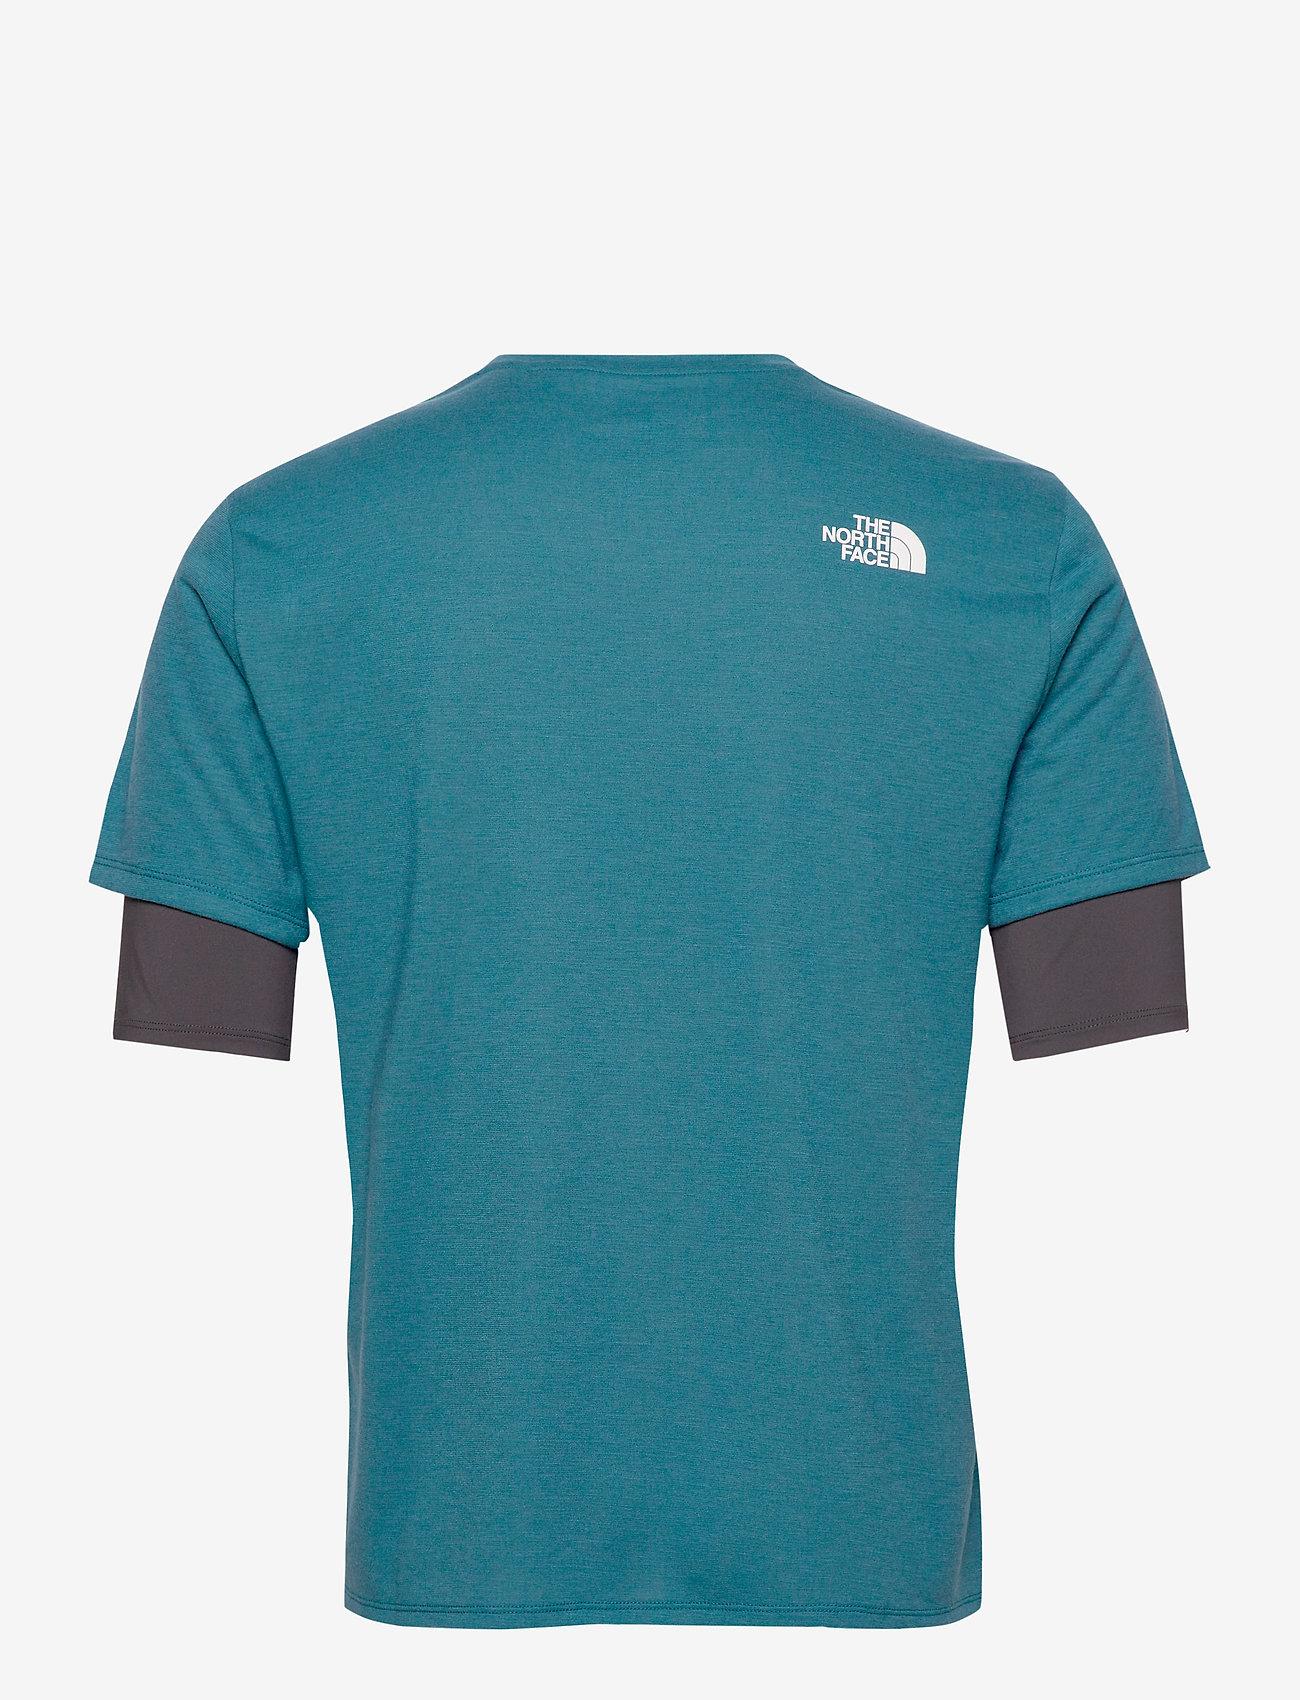 The North Face M AT S/S - T-skjorter MALLARD BLUE/ASPHALT GREY - Menn Klær